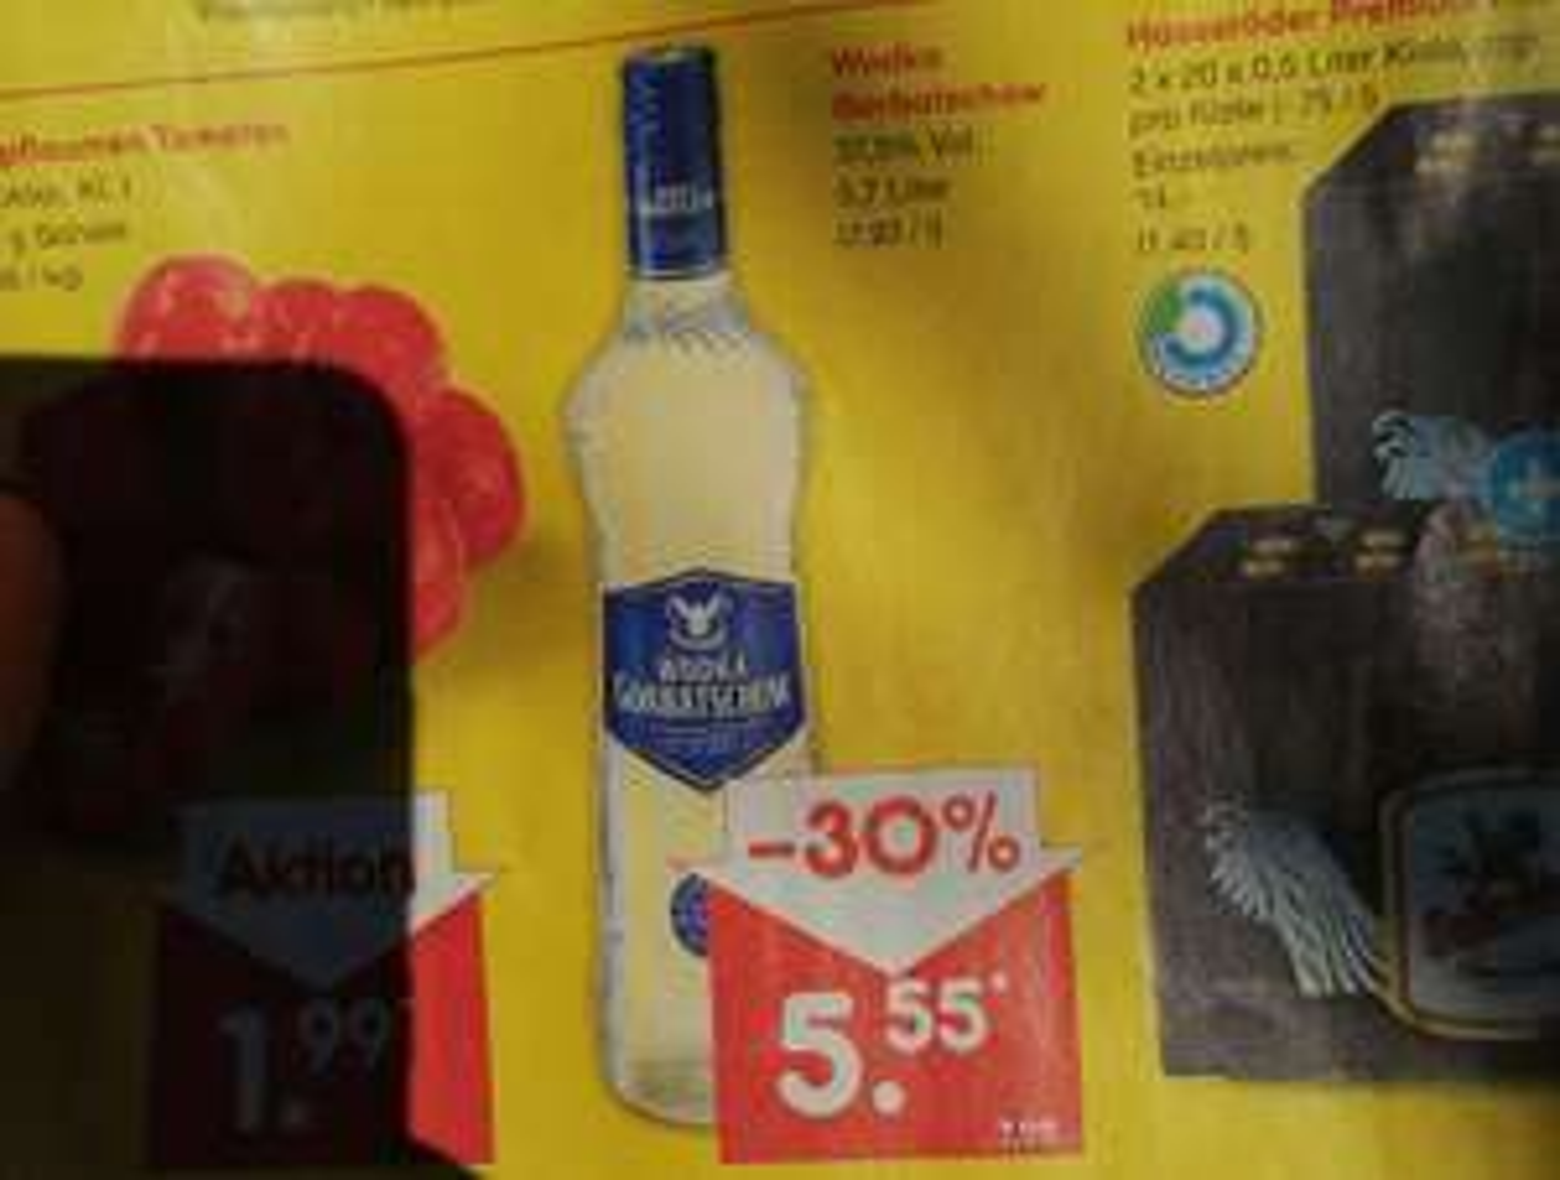 Wodka Gorbatschow Samstagskracher (03.04.2021)